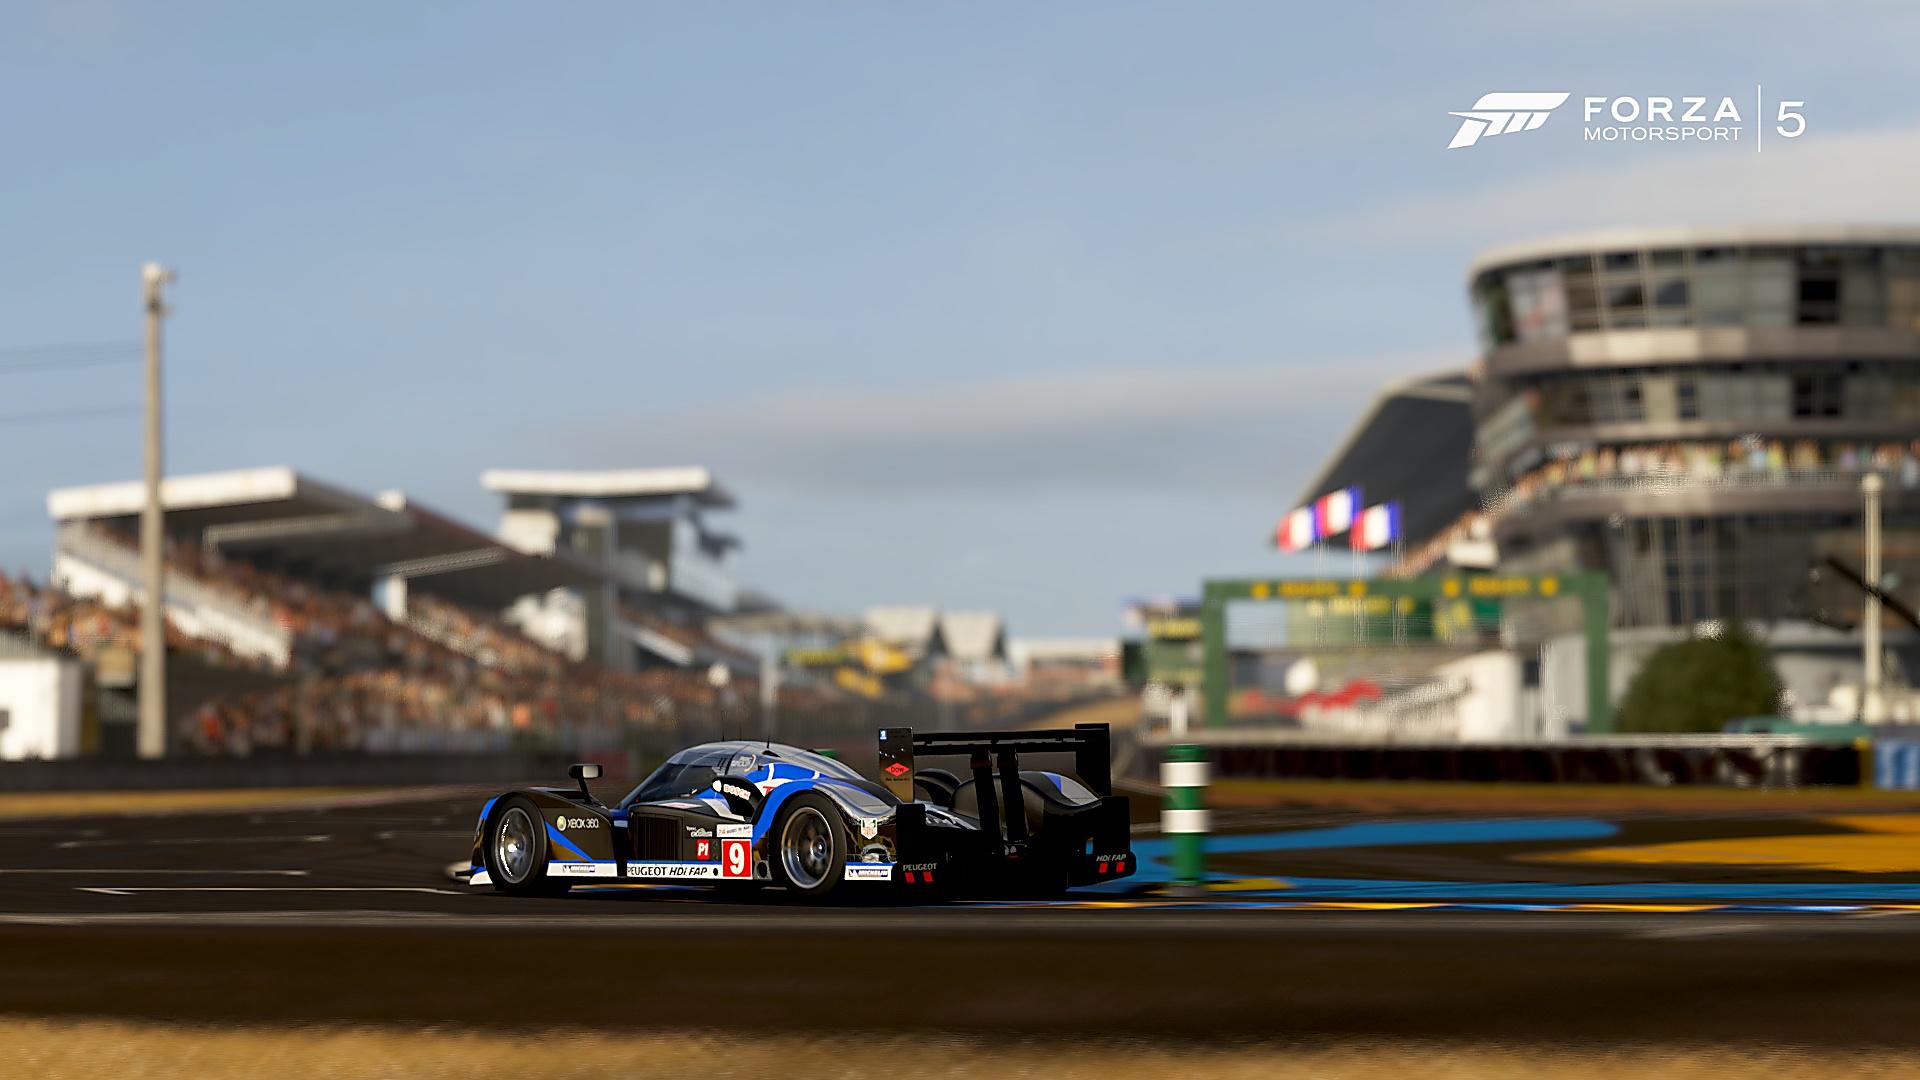 Peugeot-908-forza-motorsport